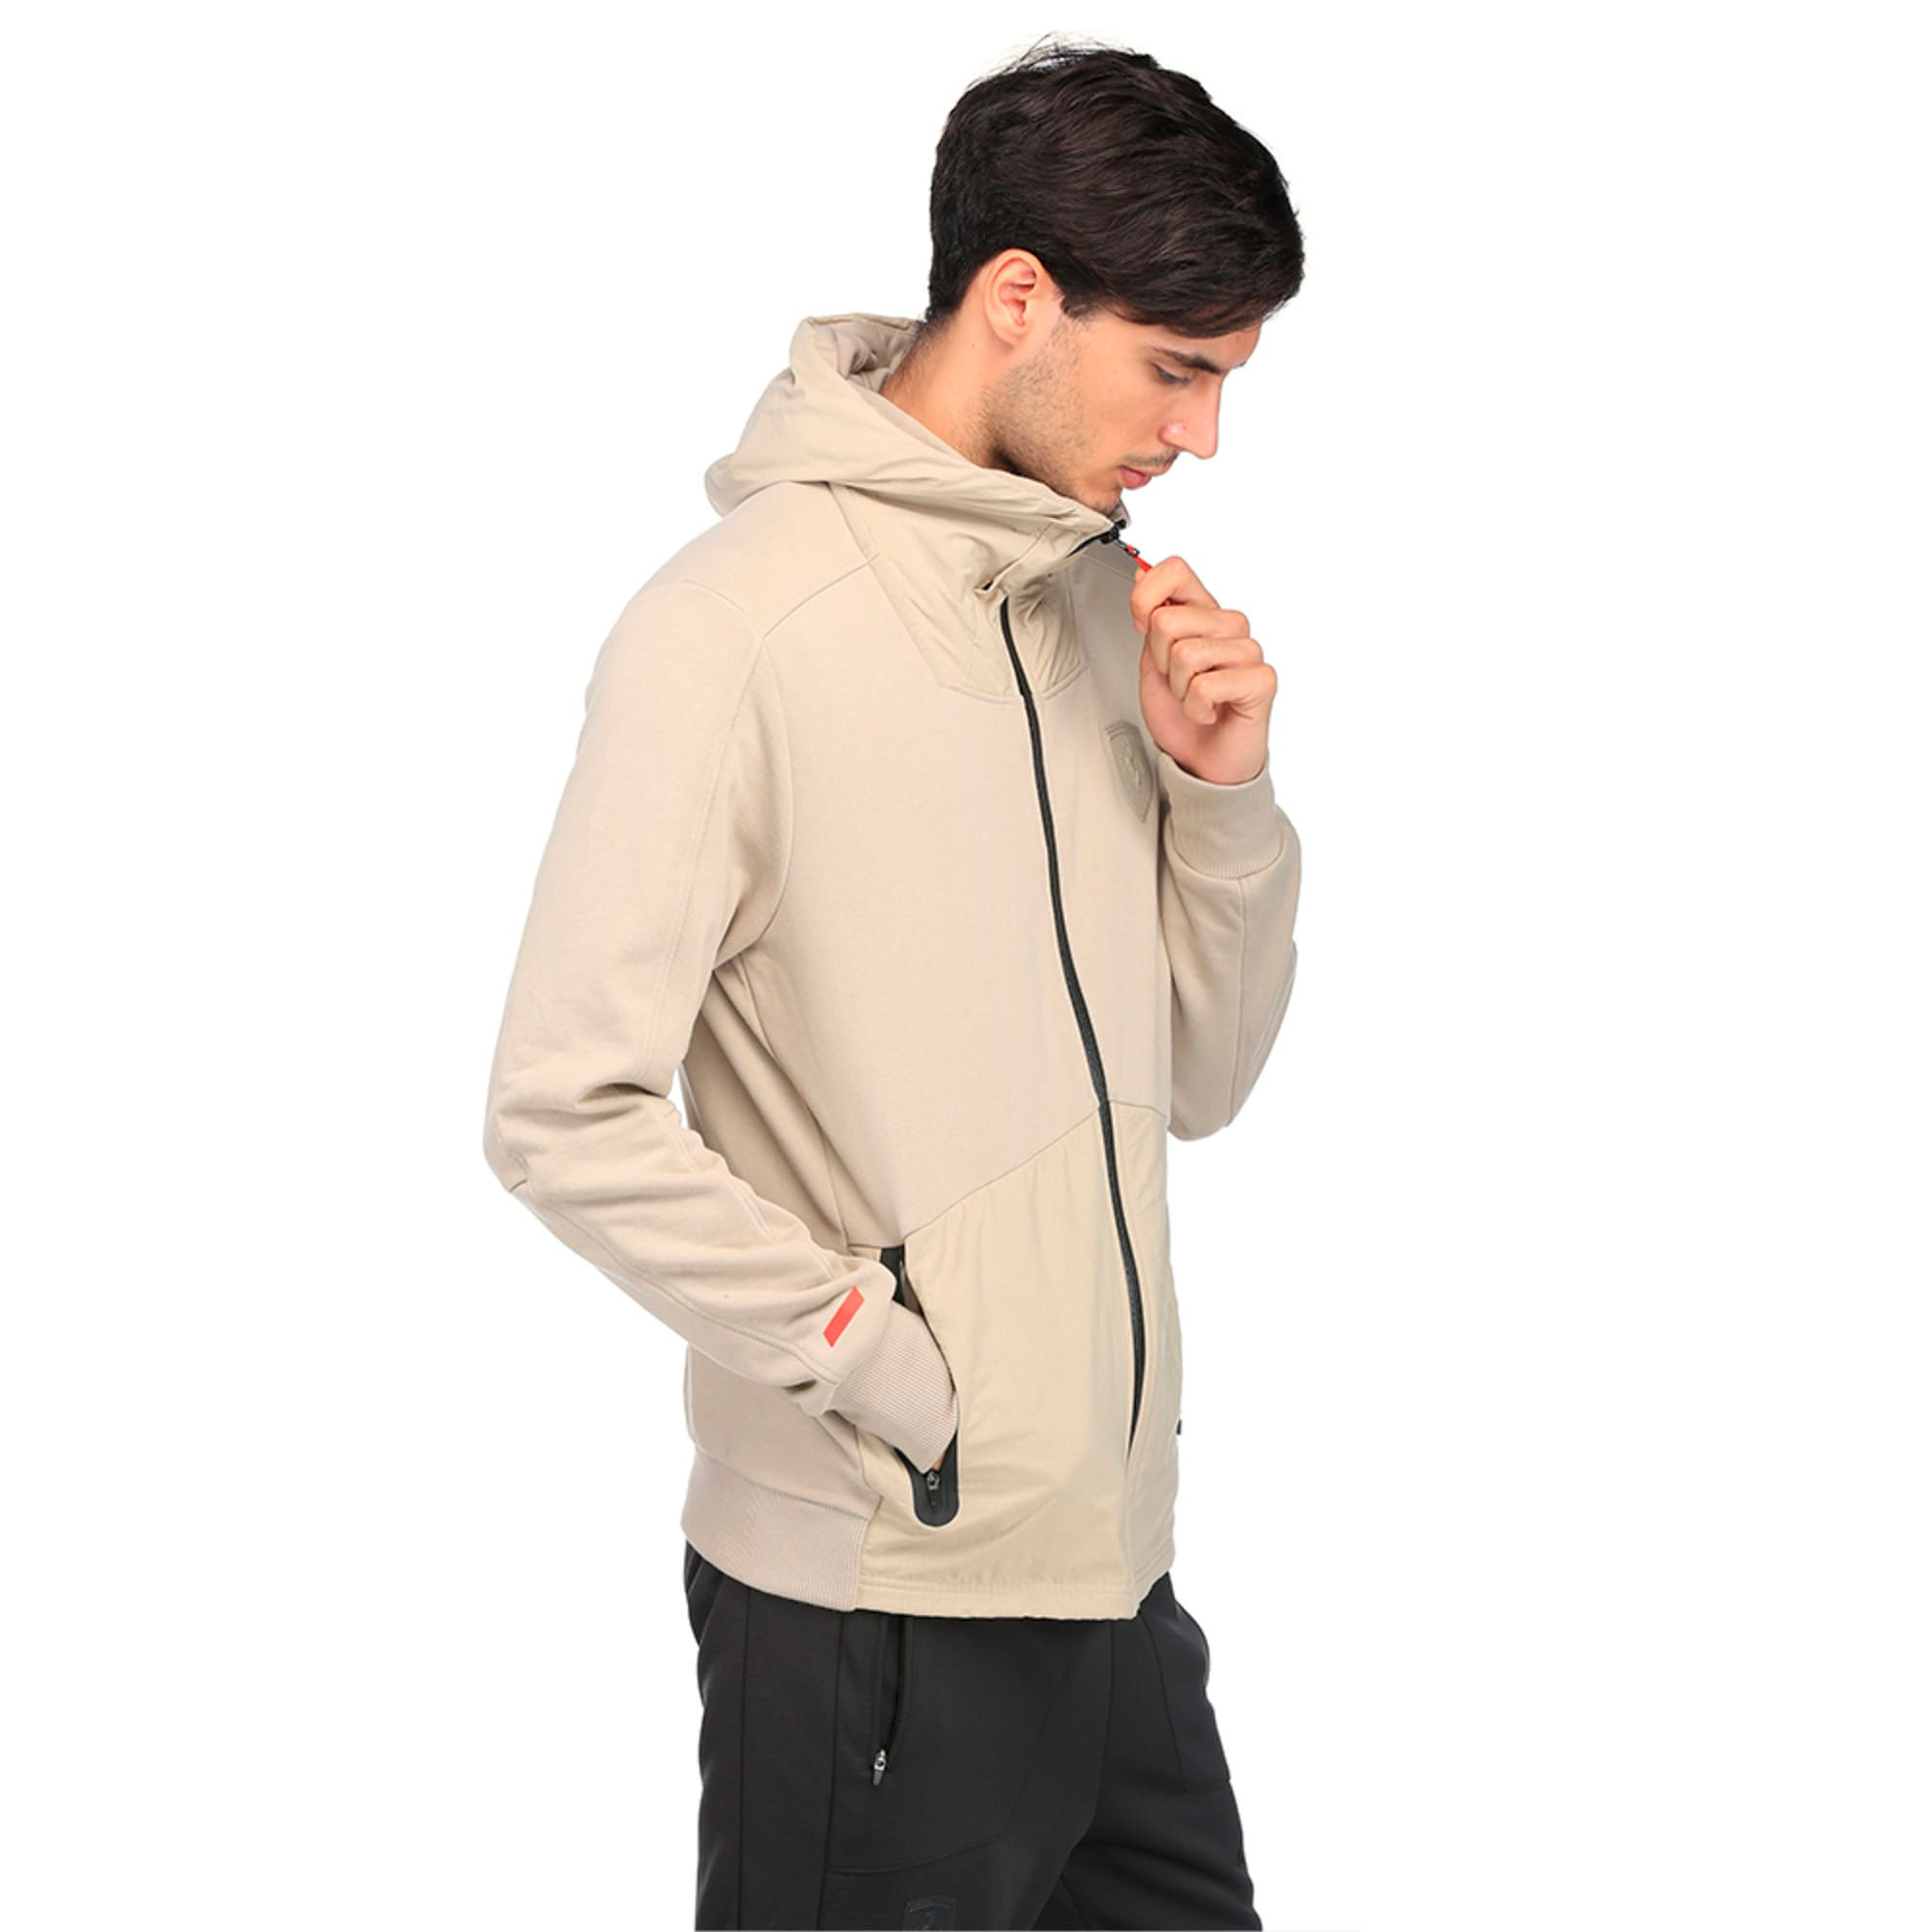 Thumbnail 3 of Ferrari Lifestyle Men's Hooded Sweat Jacket, Pure Cashmere, medium-IND